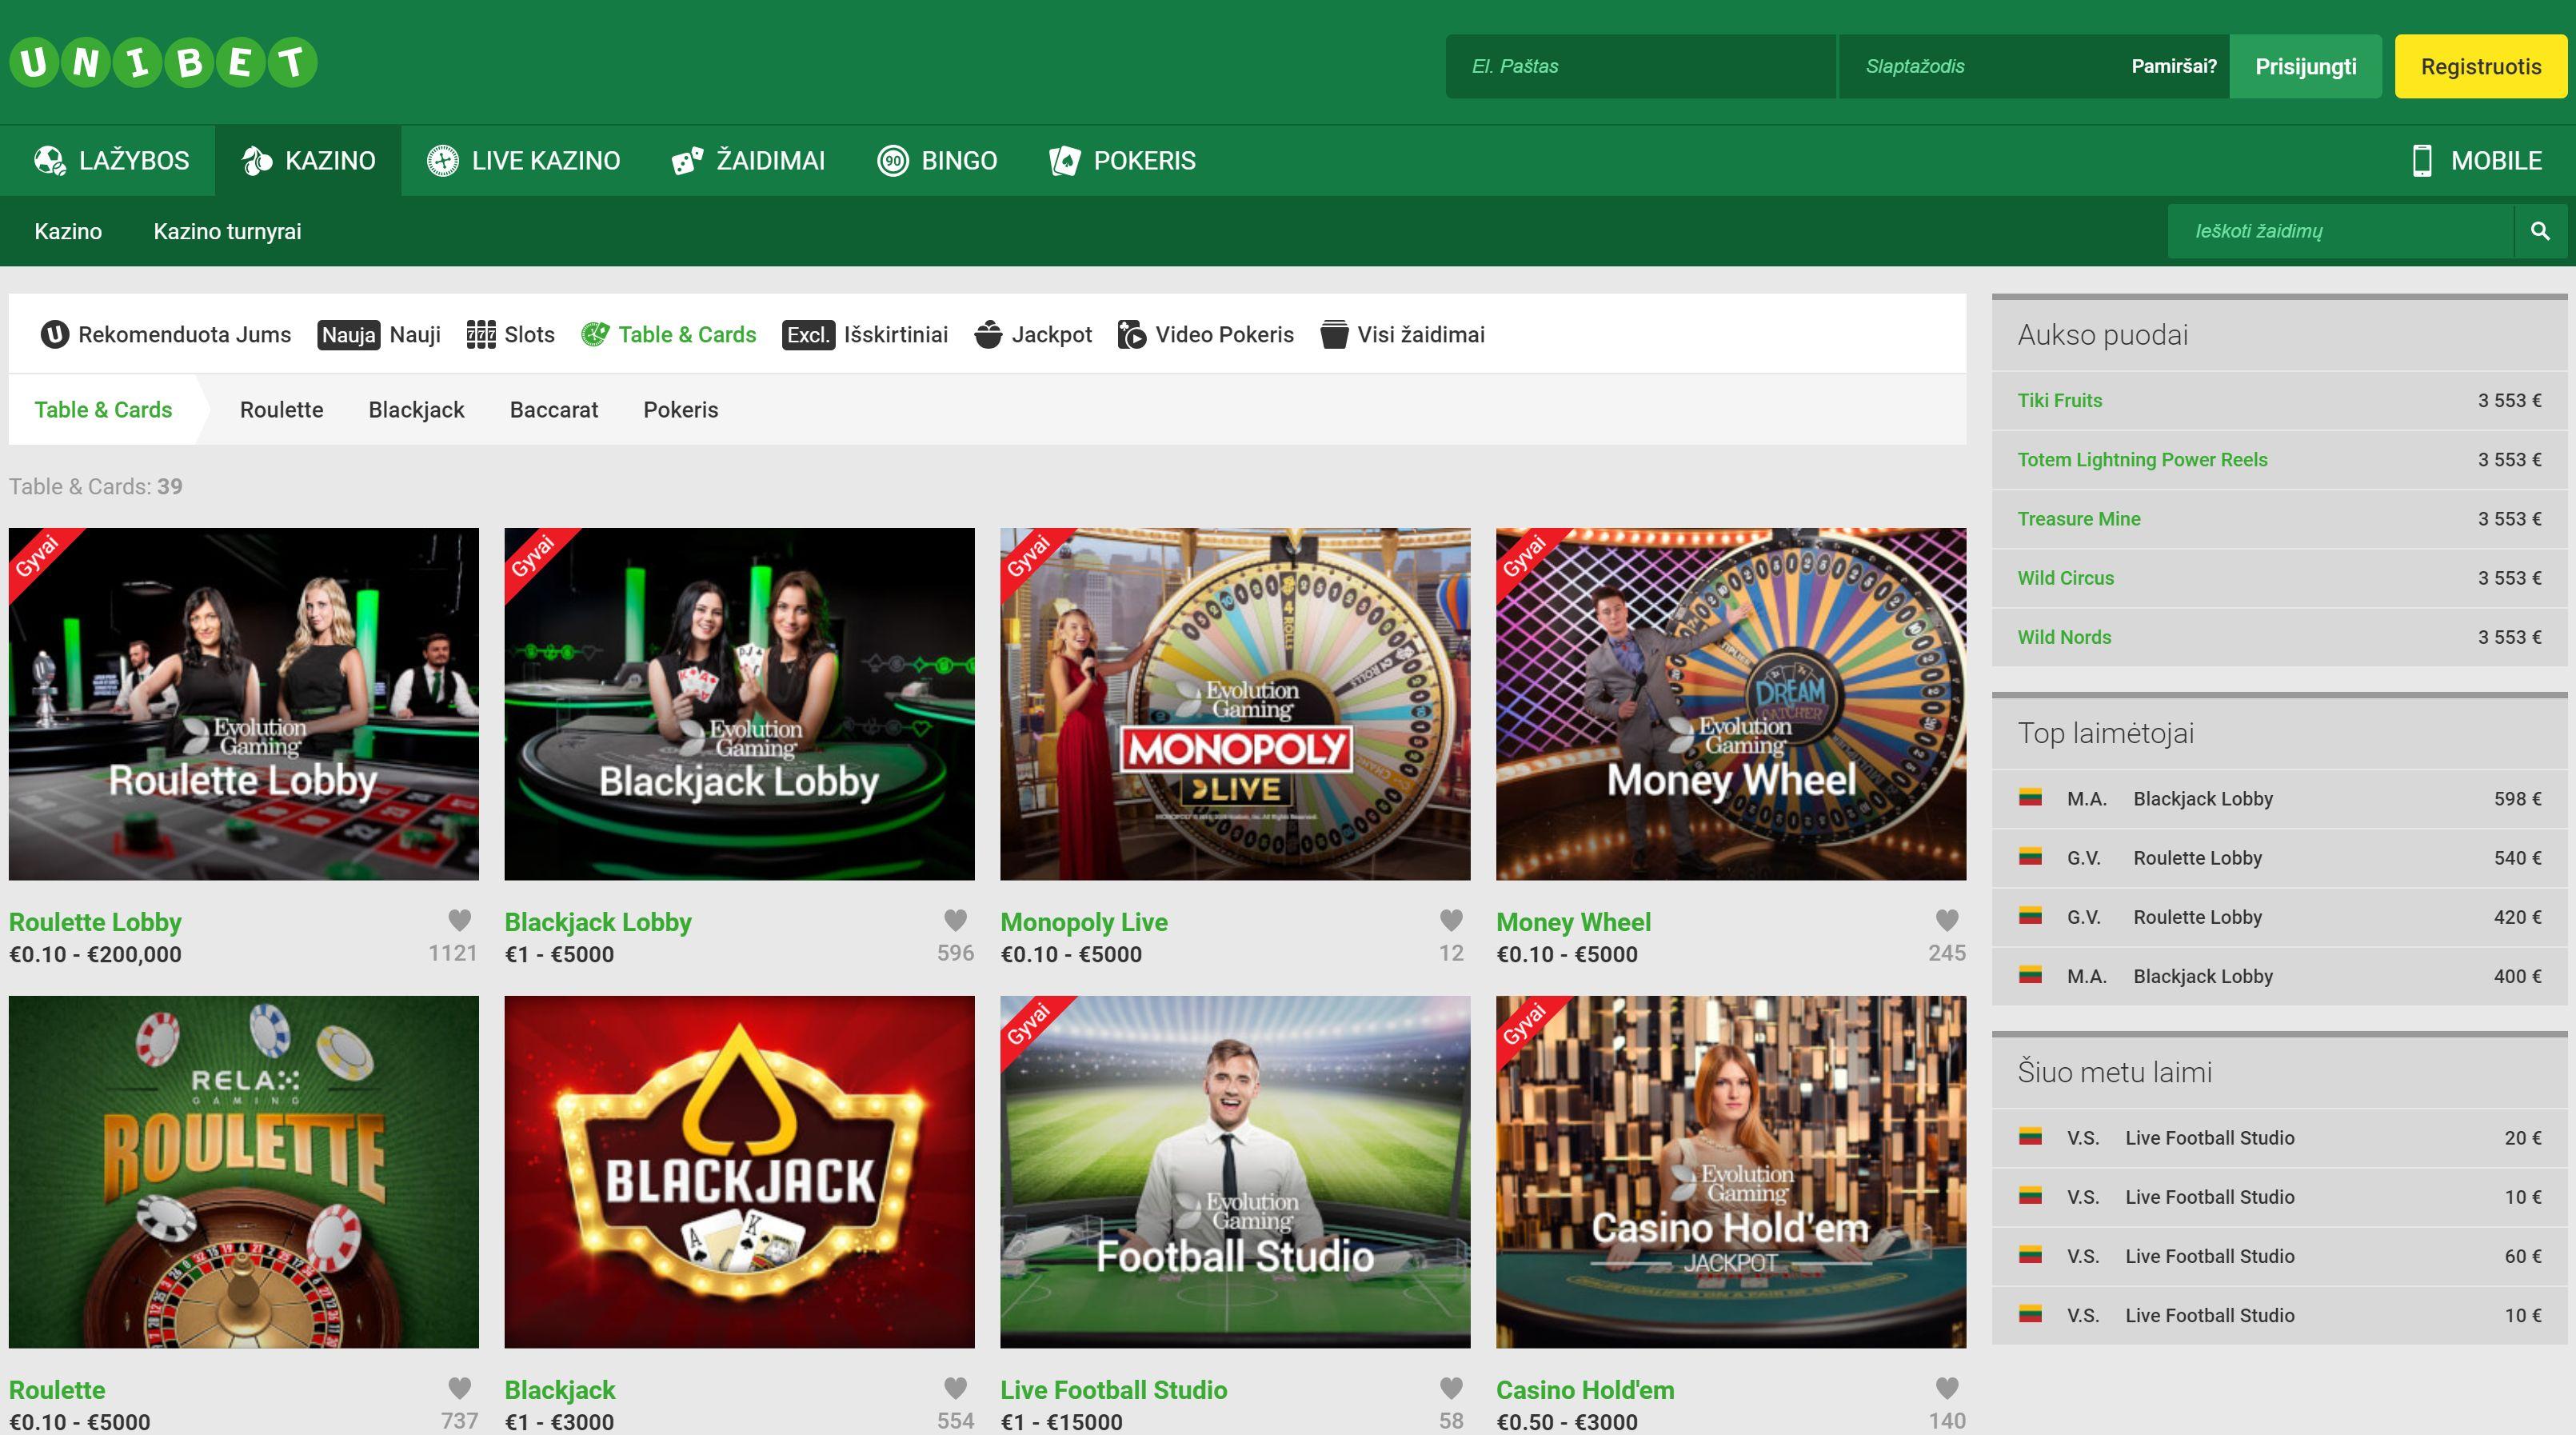 lt unibet lietuva casino rulete blackjack baccarat slots